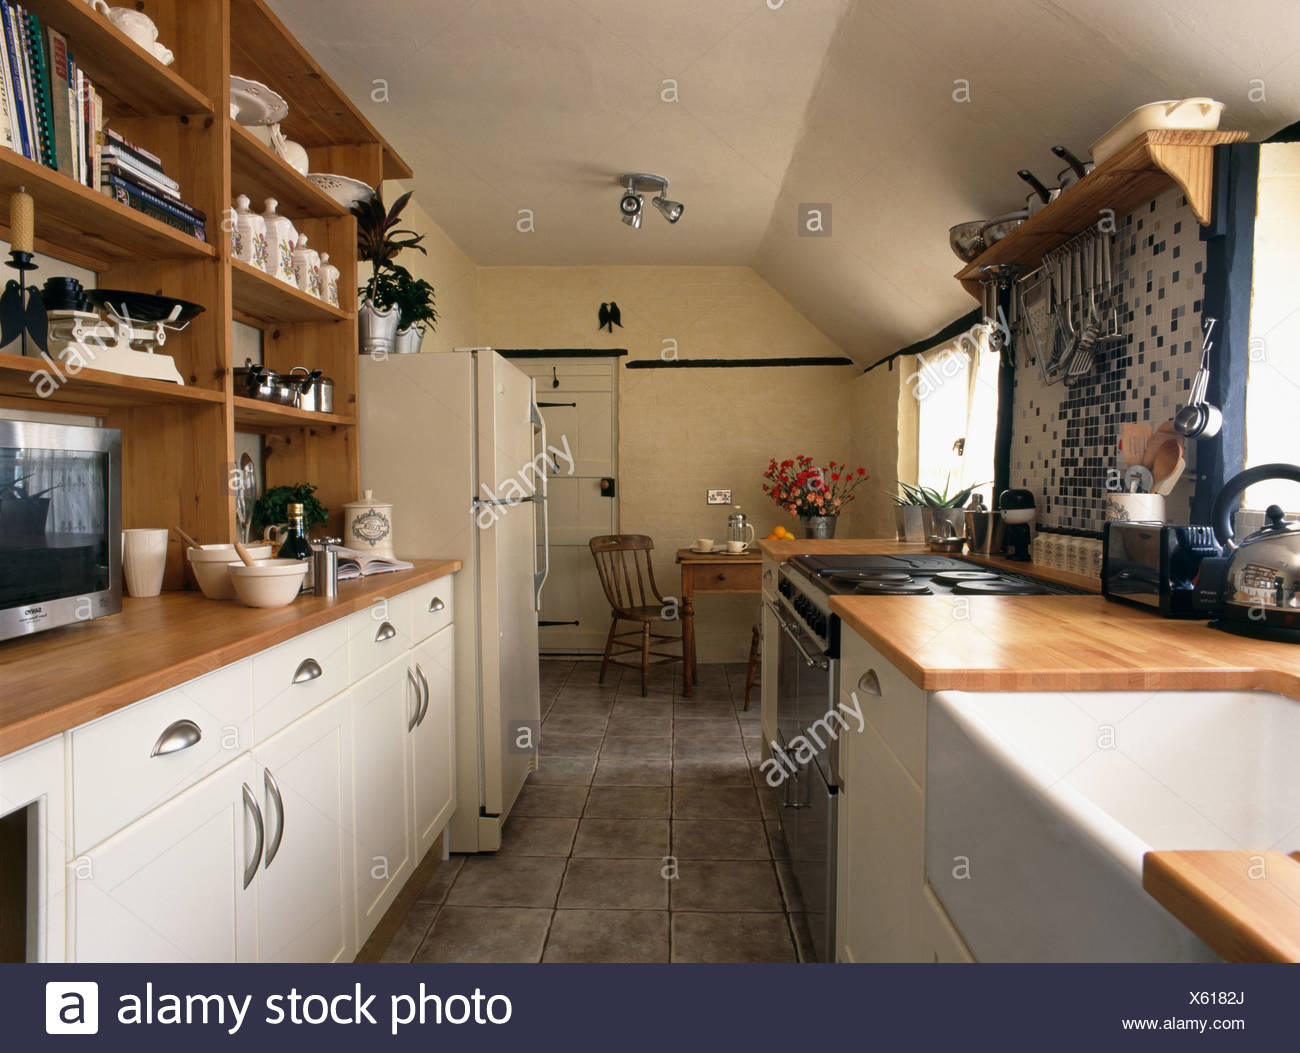 Belfast sink in traditional galley kitchen with cream ed units ... on open galley kitchen remodel, stove kitchen design ideas, walk in closet design ideas, white galley kitchen design ideas,